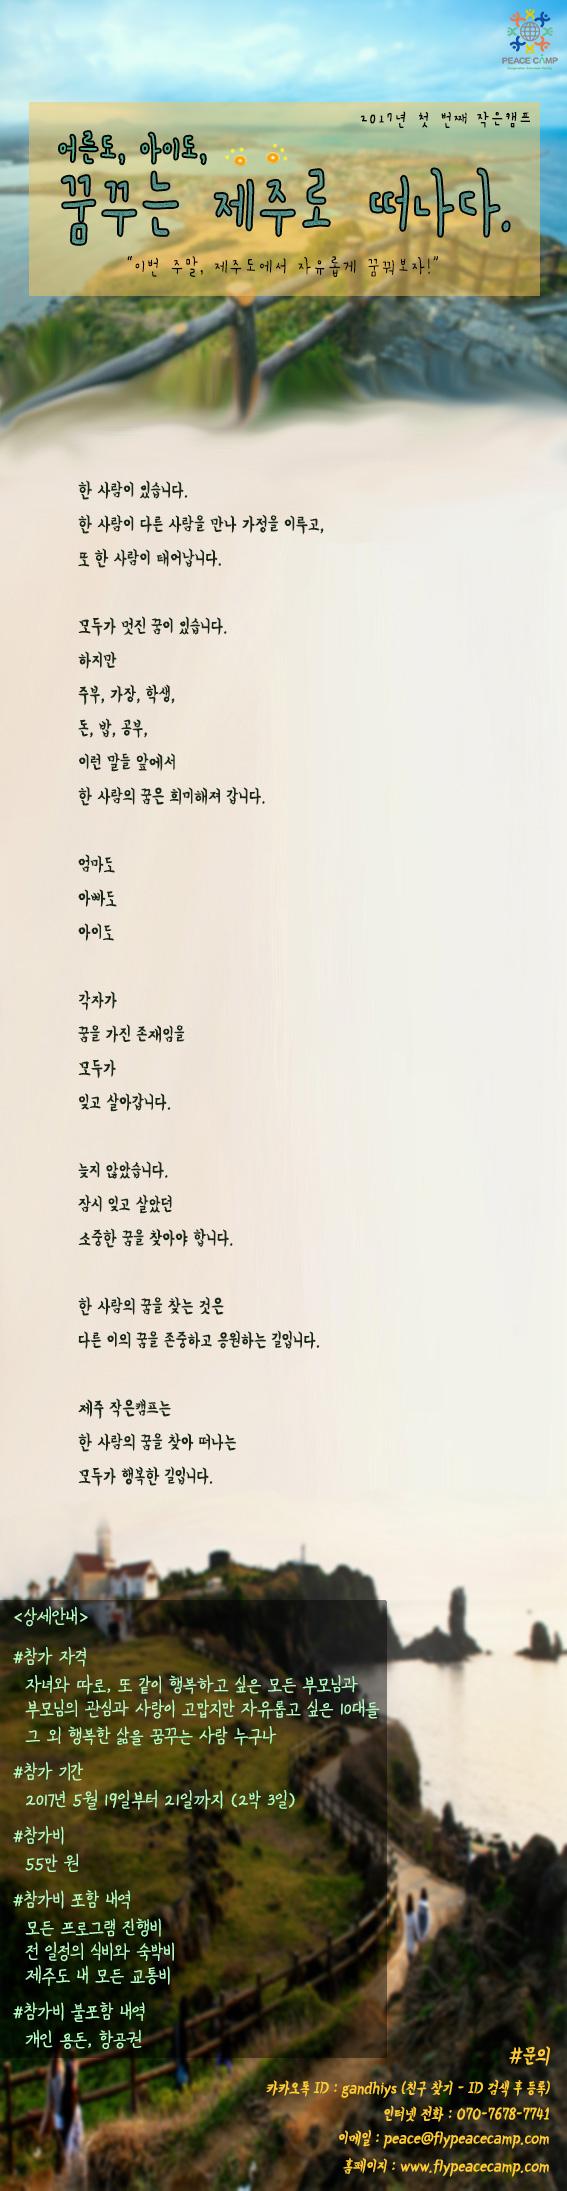 SC_Jeju_Main.jpg